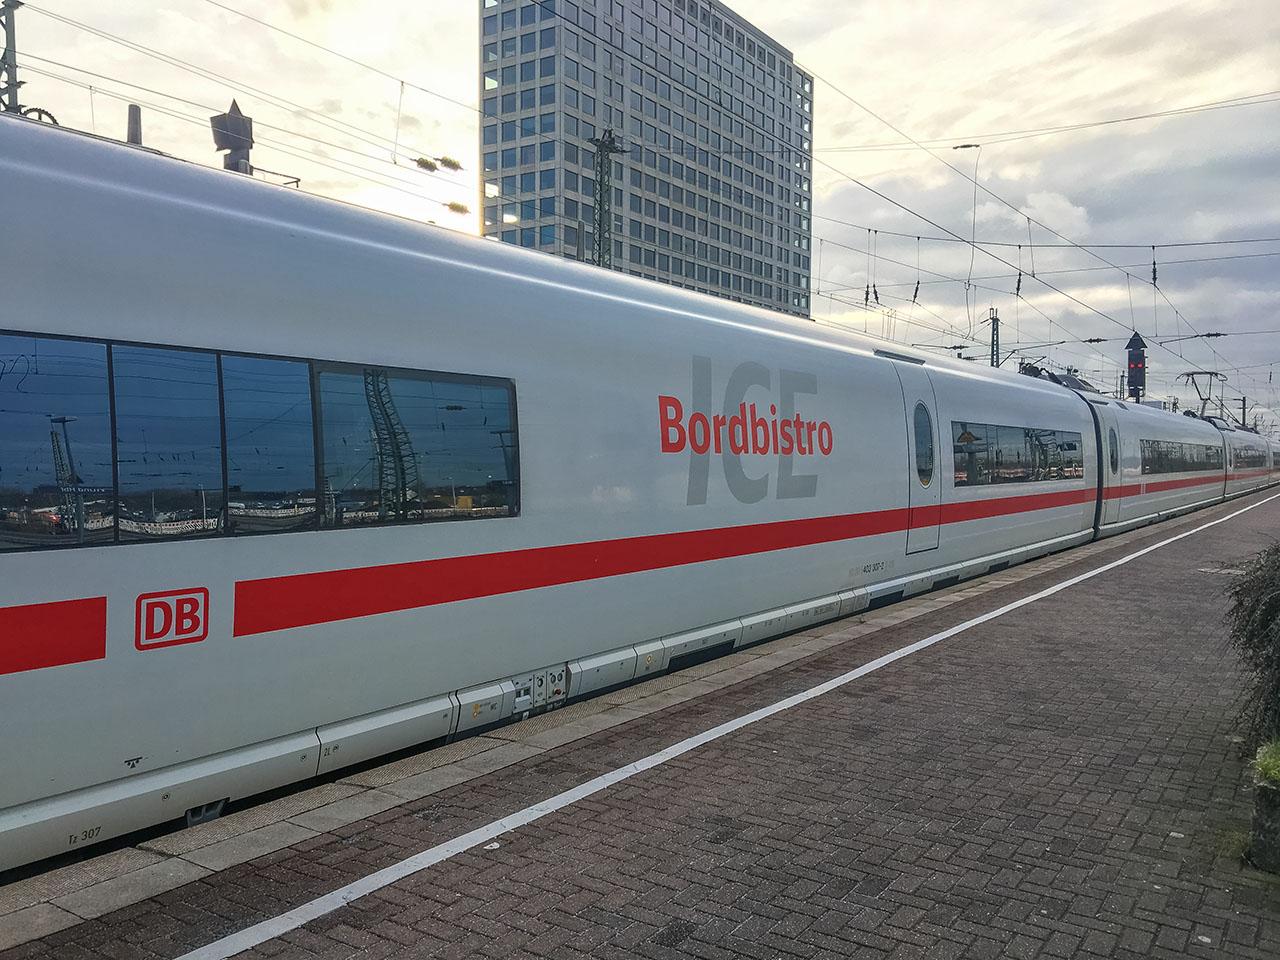 Bahn Speisewagen Service